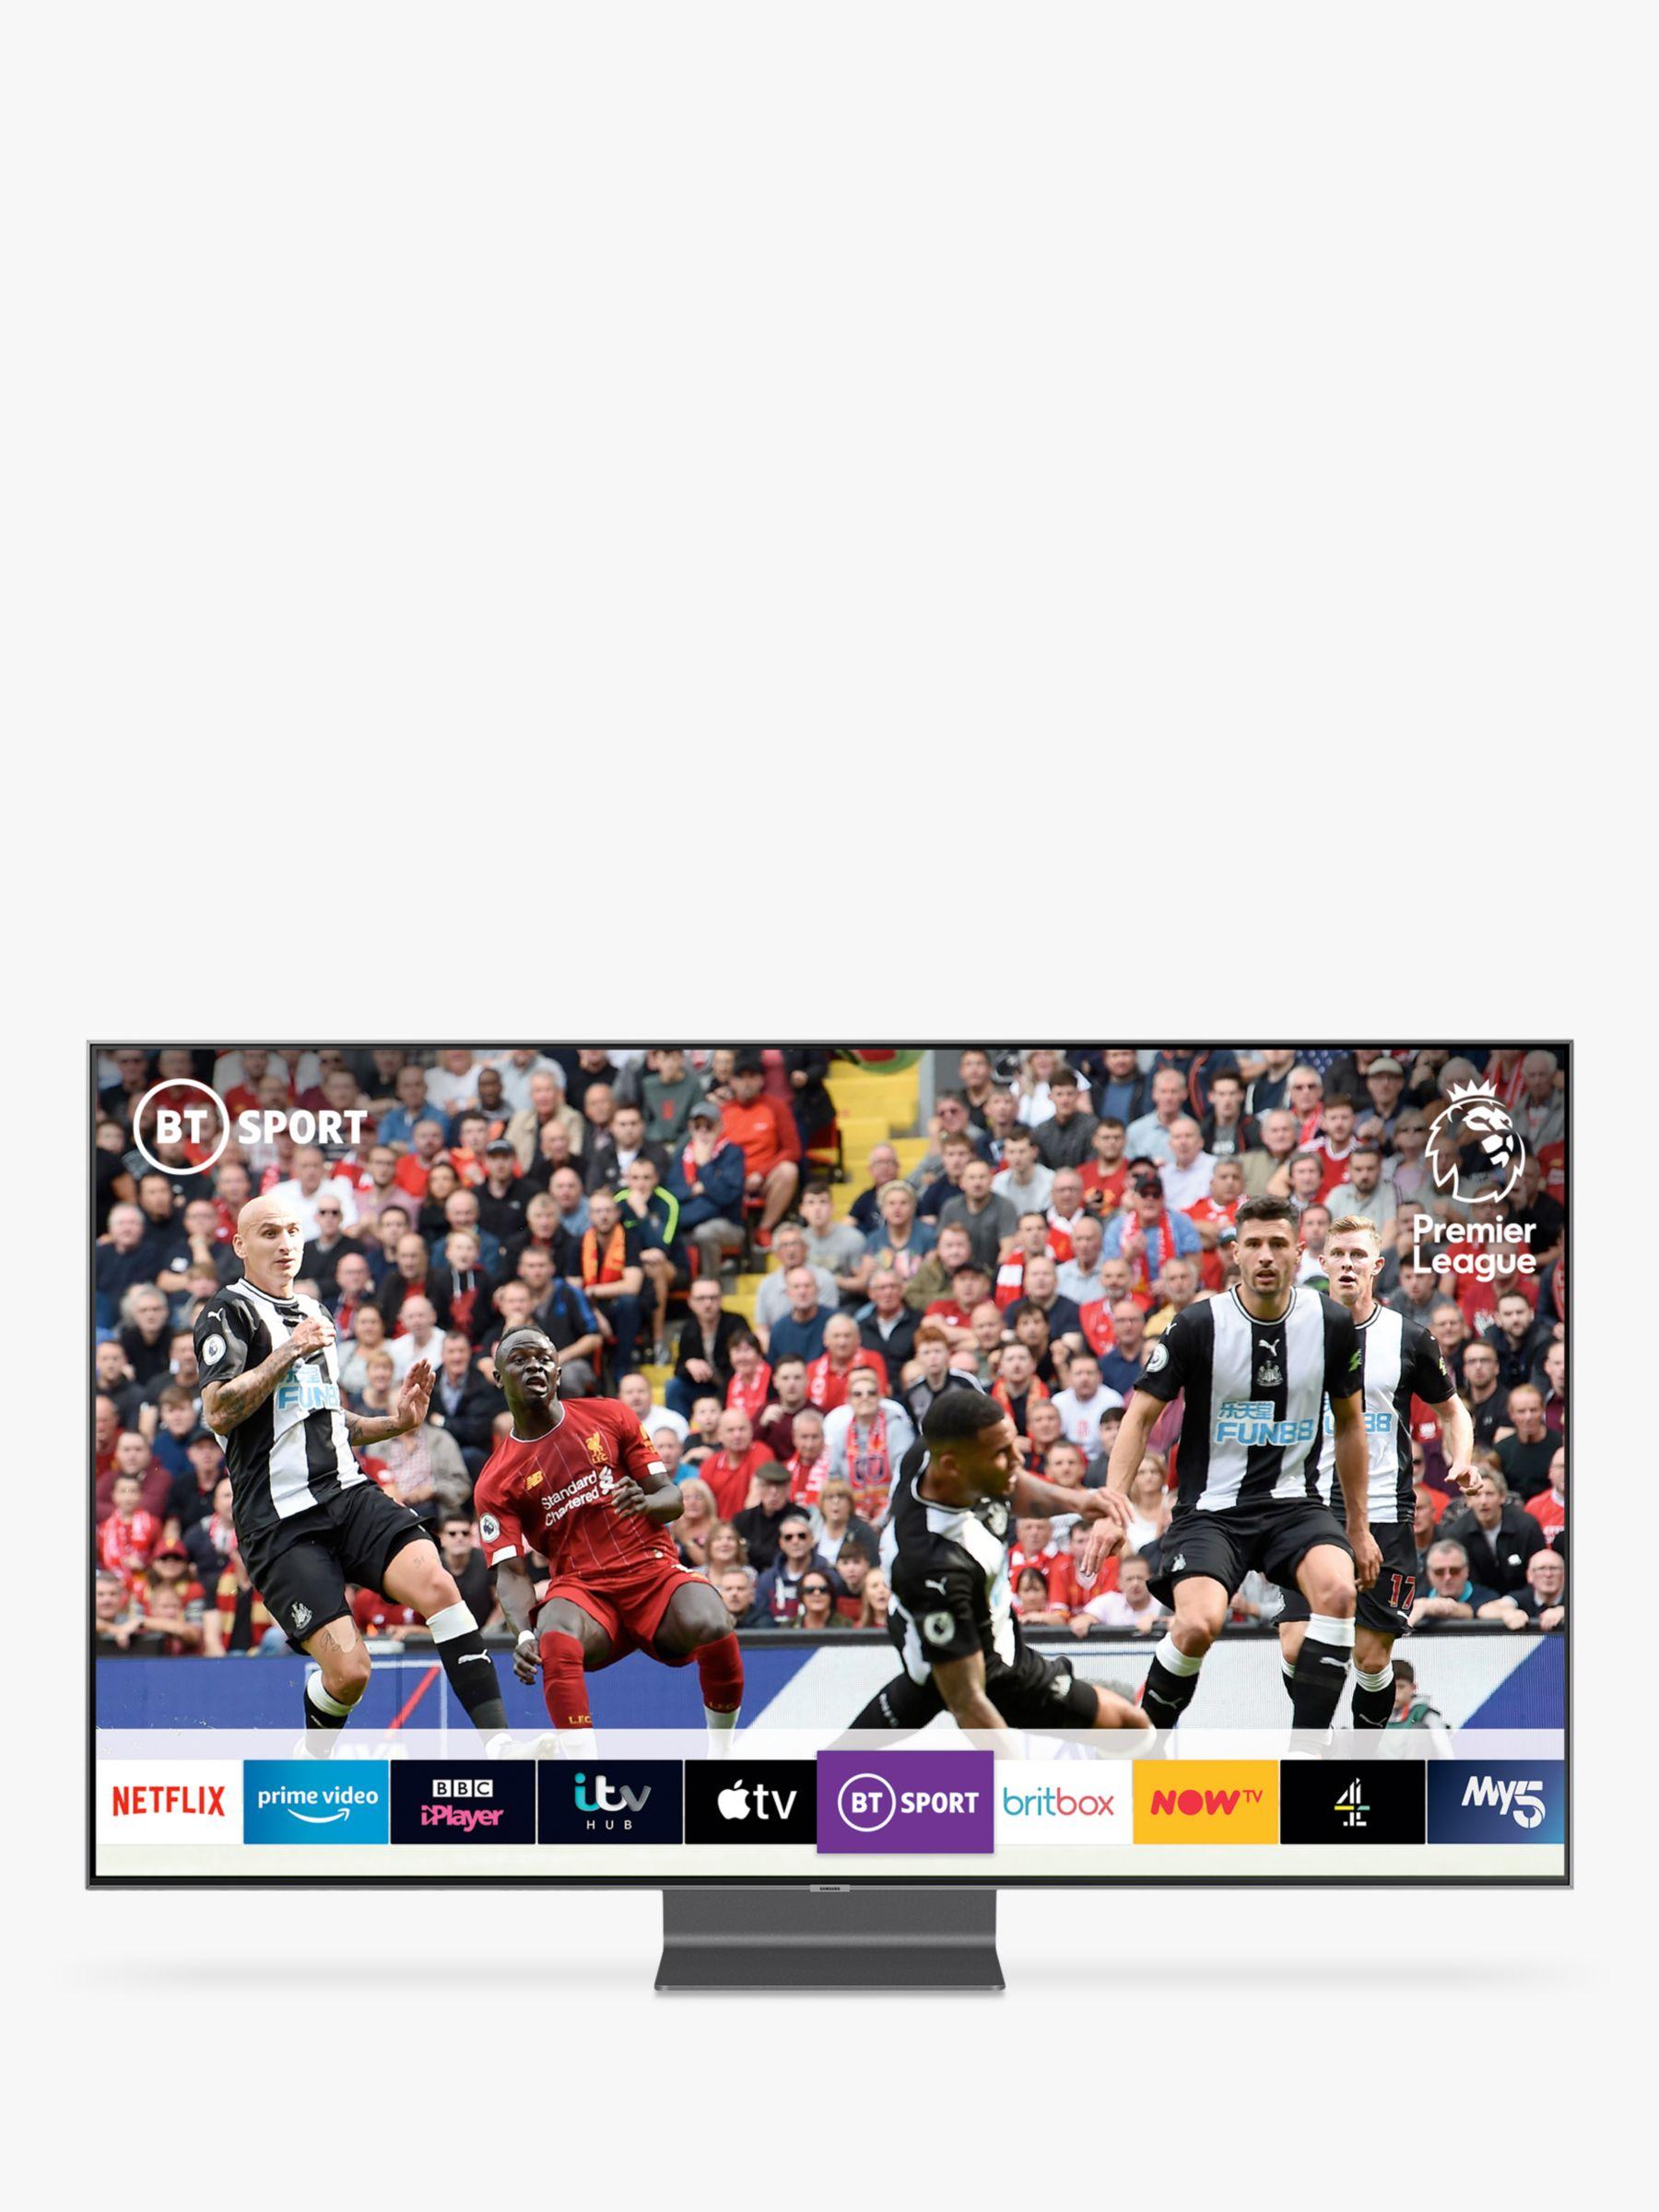 Samsung QE65Q90R (2019) QLED HDR 2000 4K Ultra HD Smart TV, 65